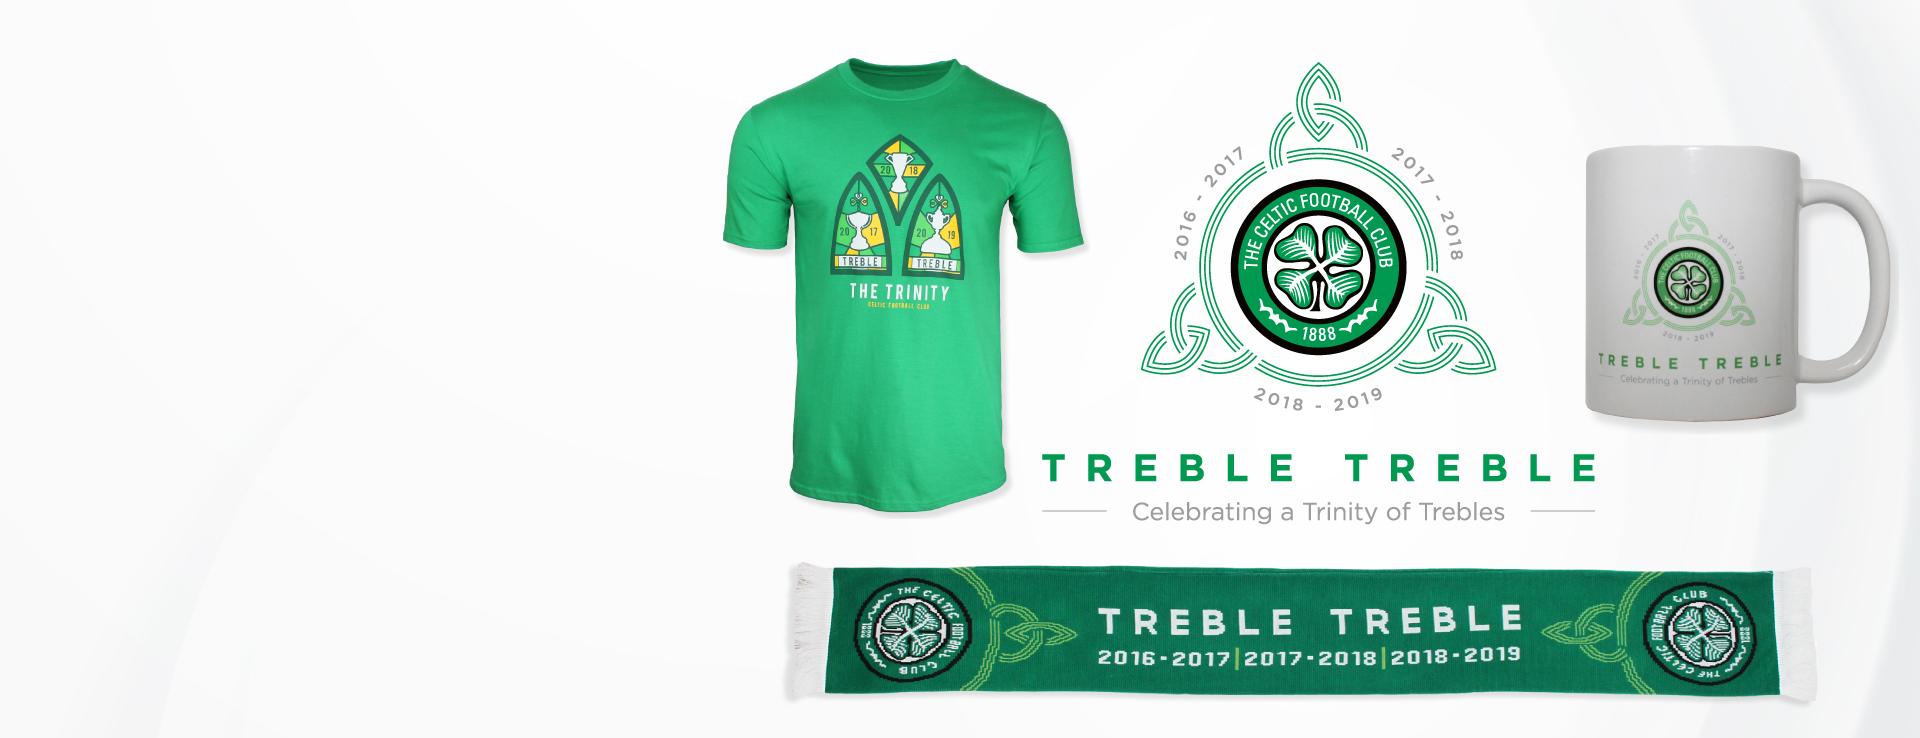 Treble Treble Champions